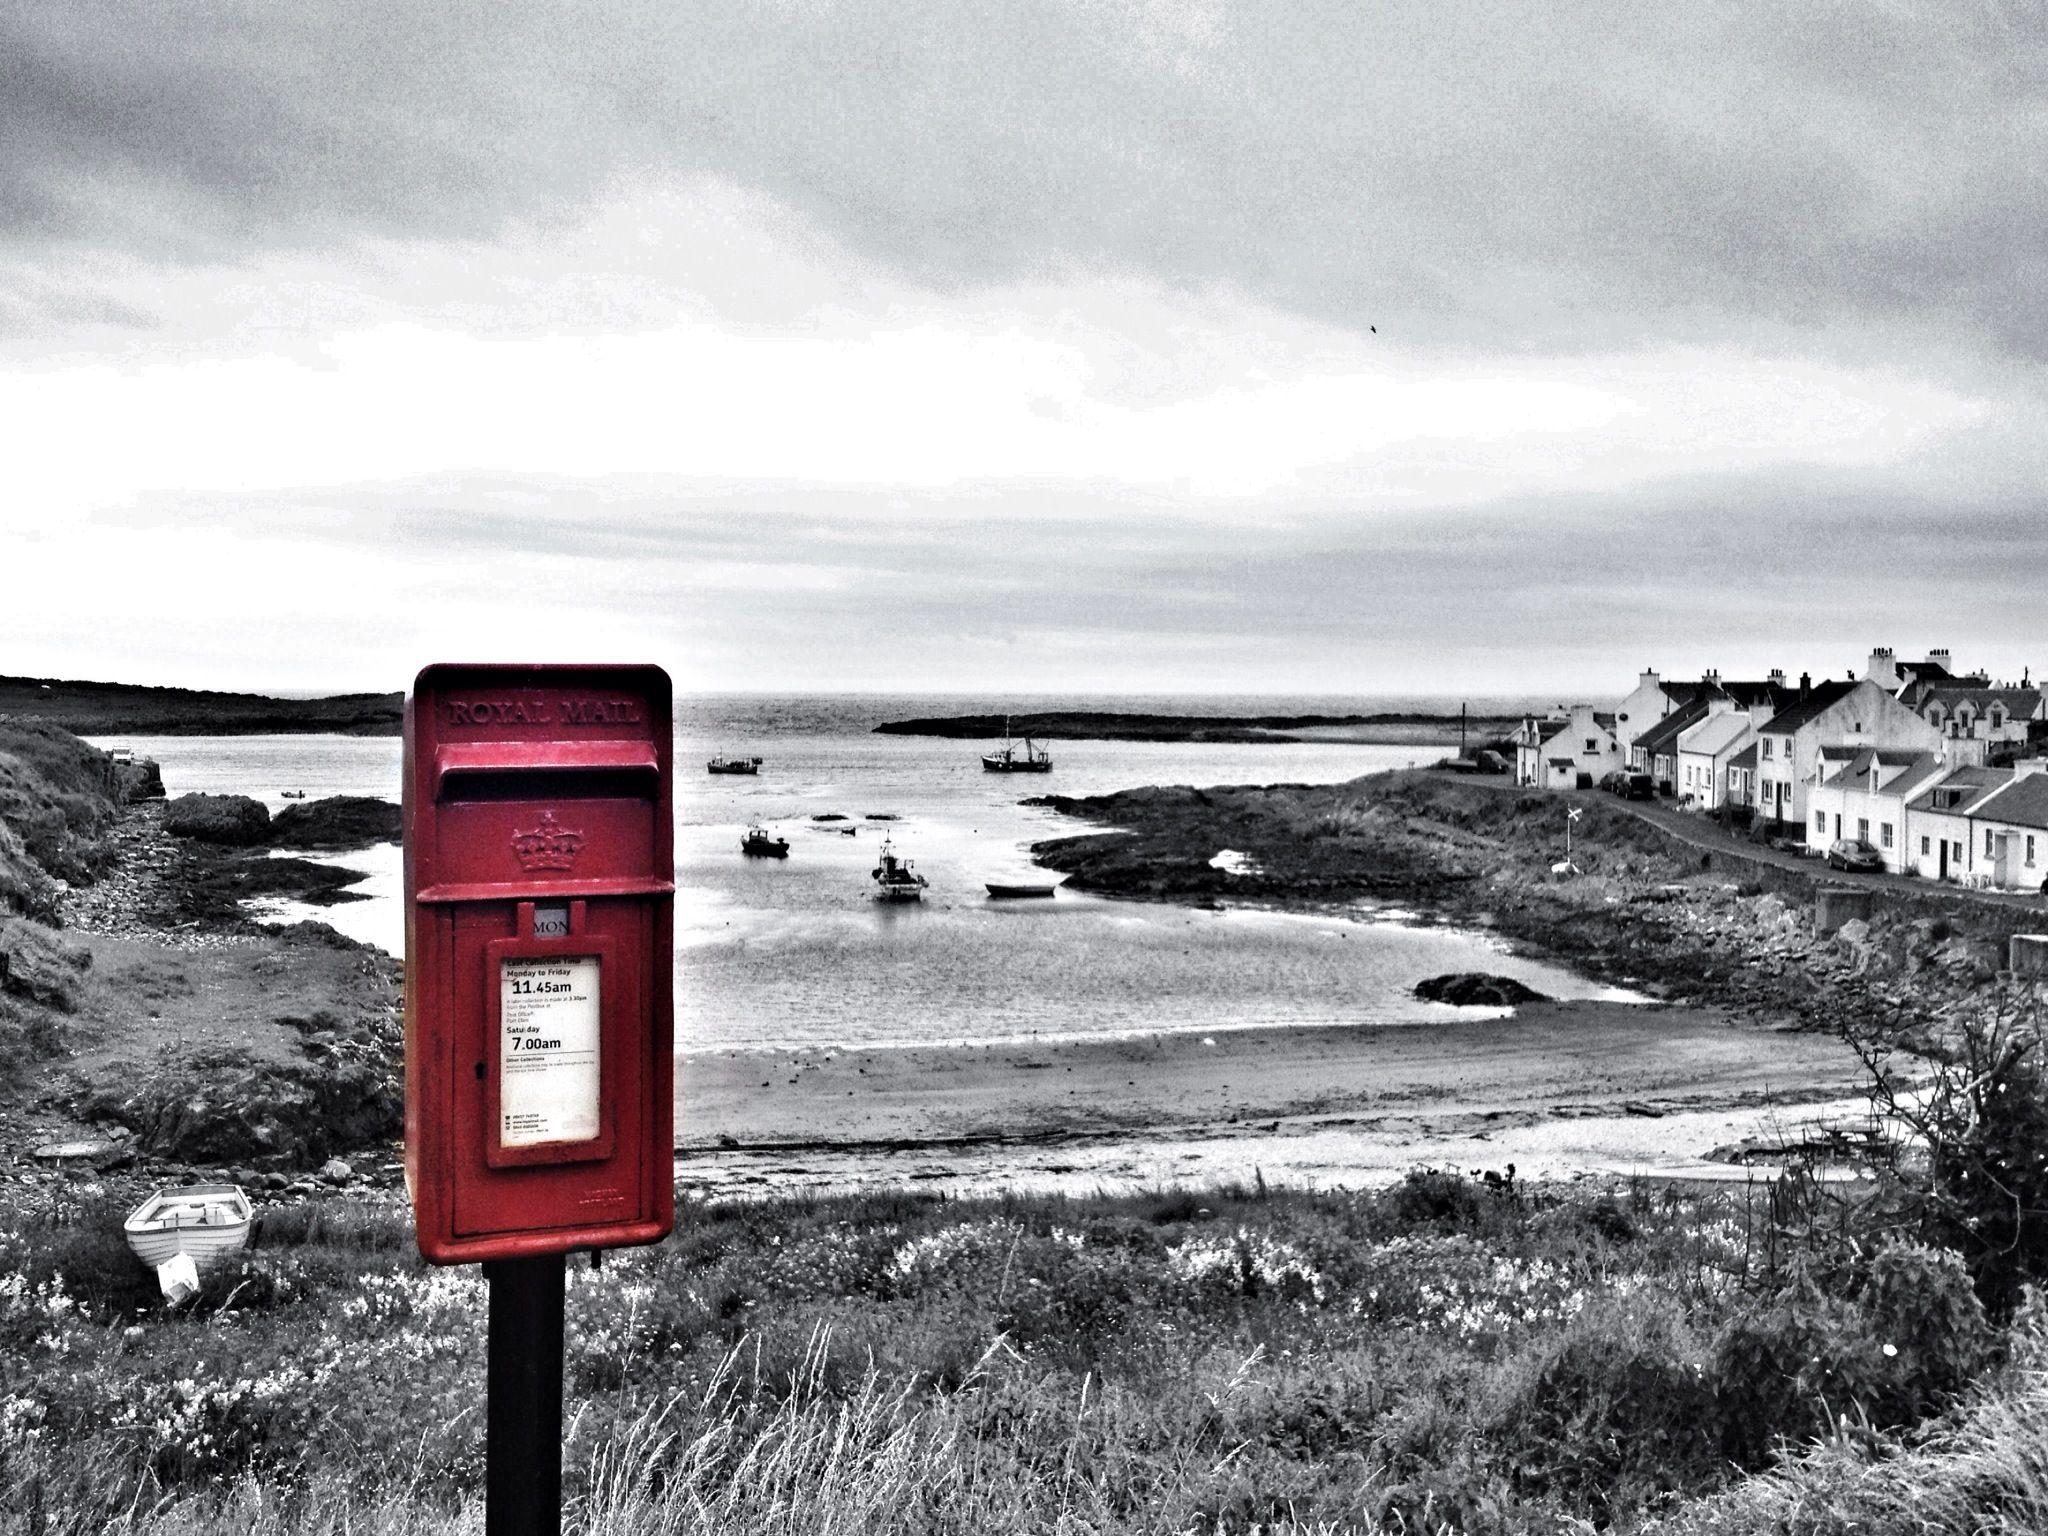 Portnahaven, Isle of Islay, Scotland